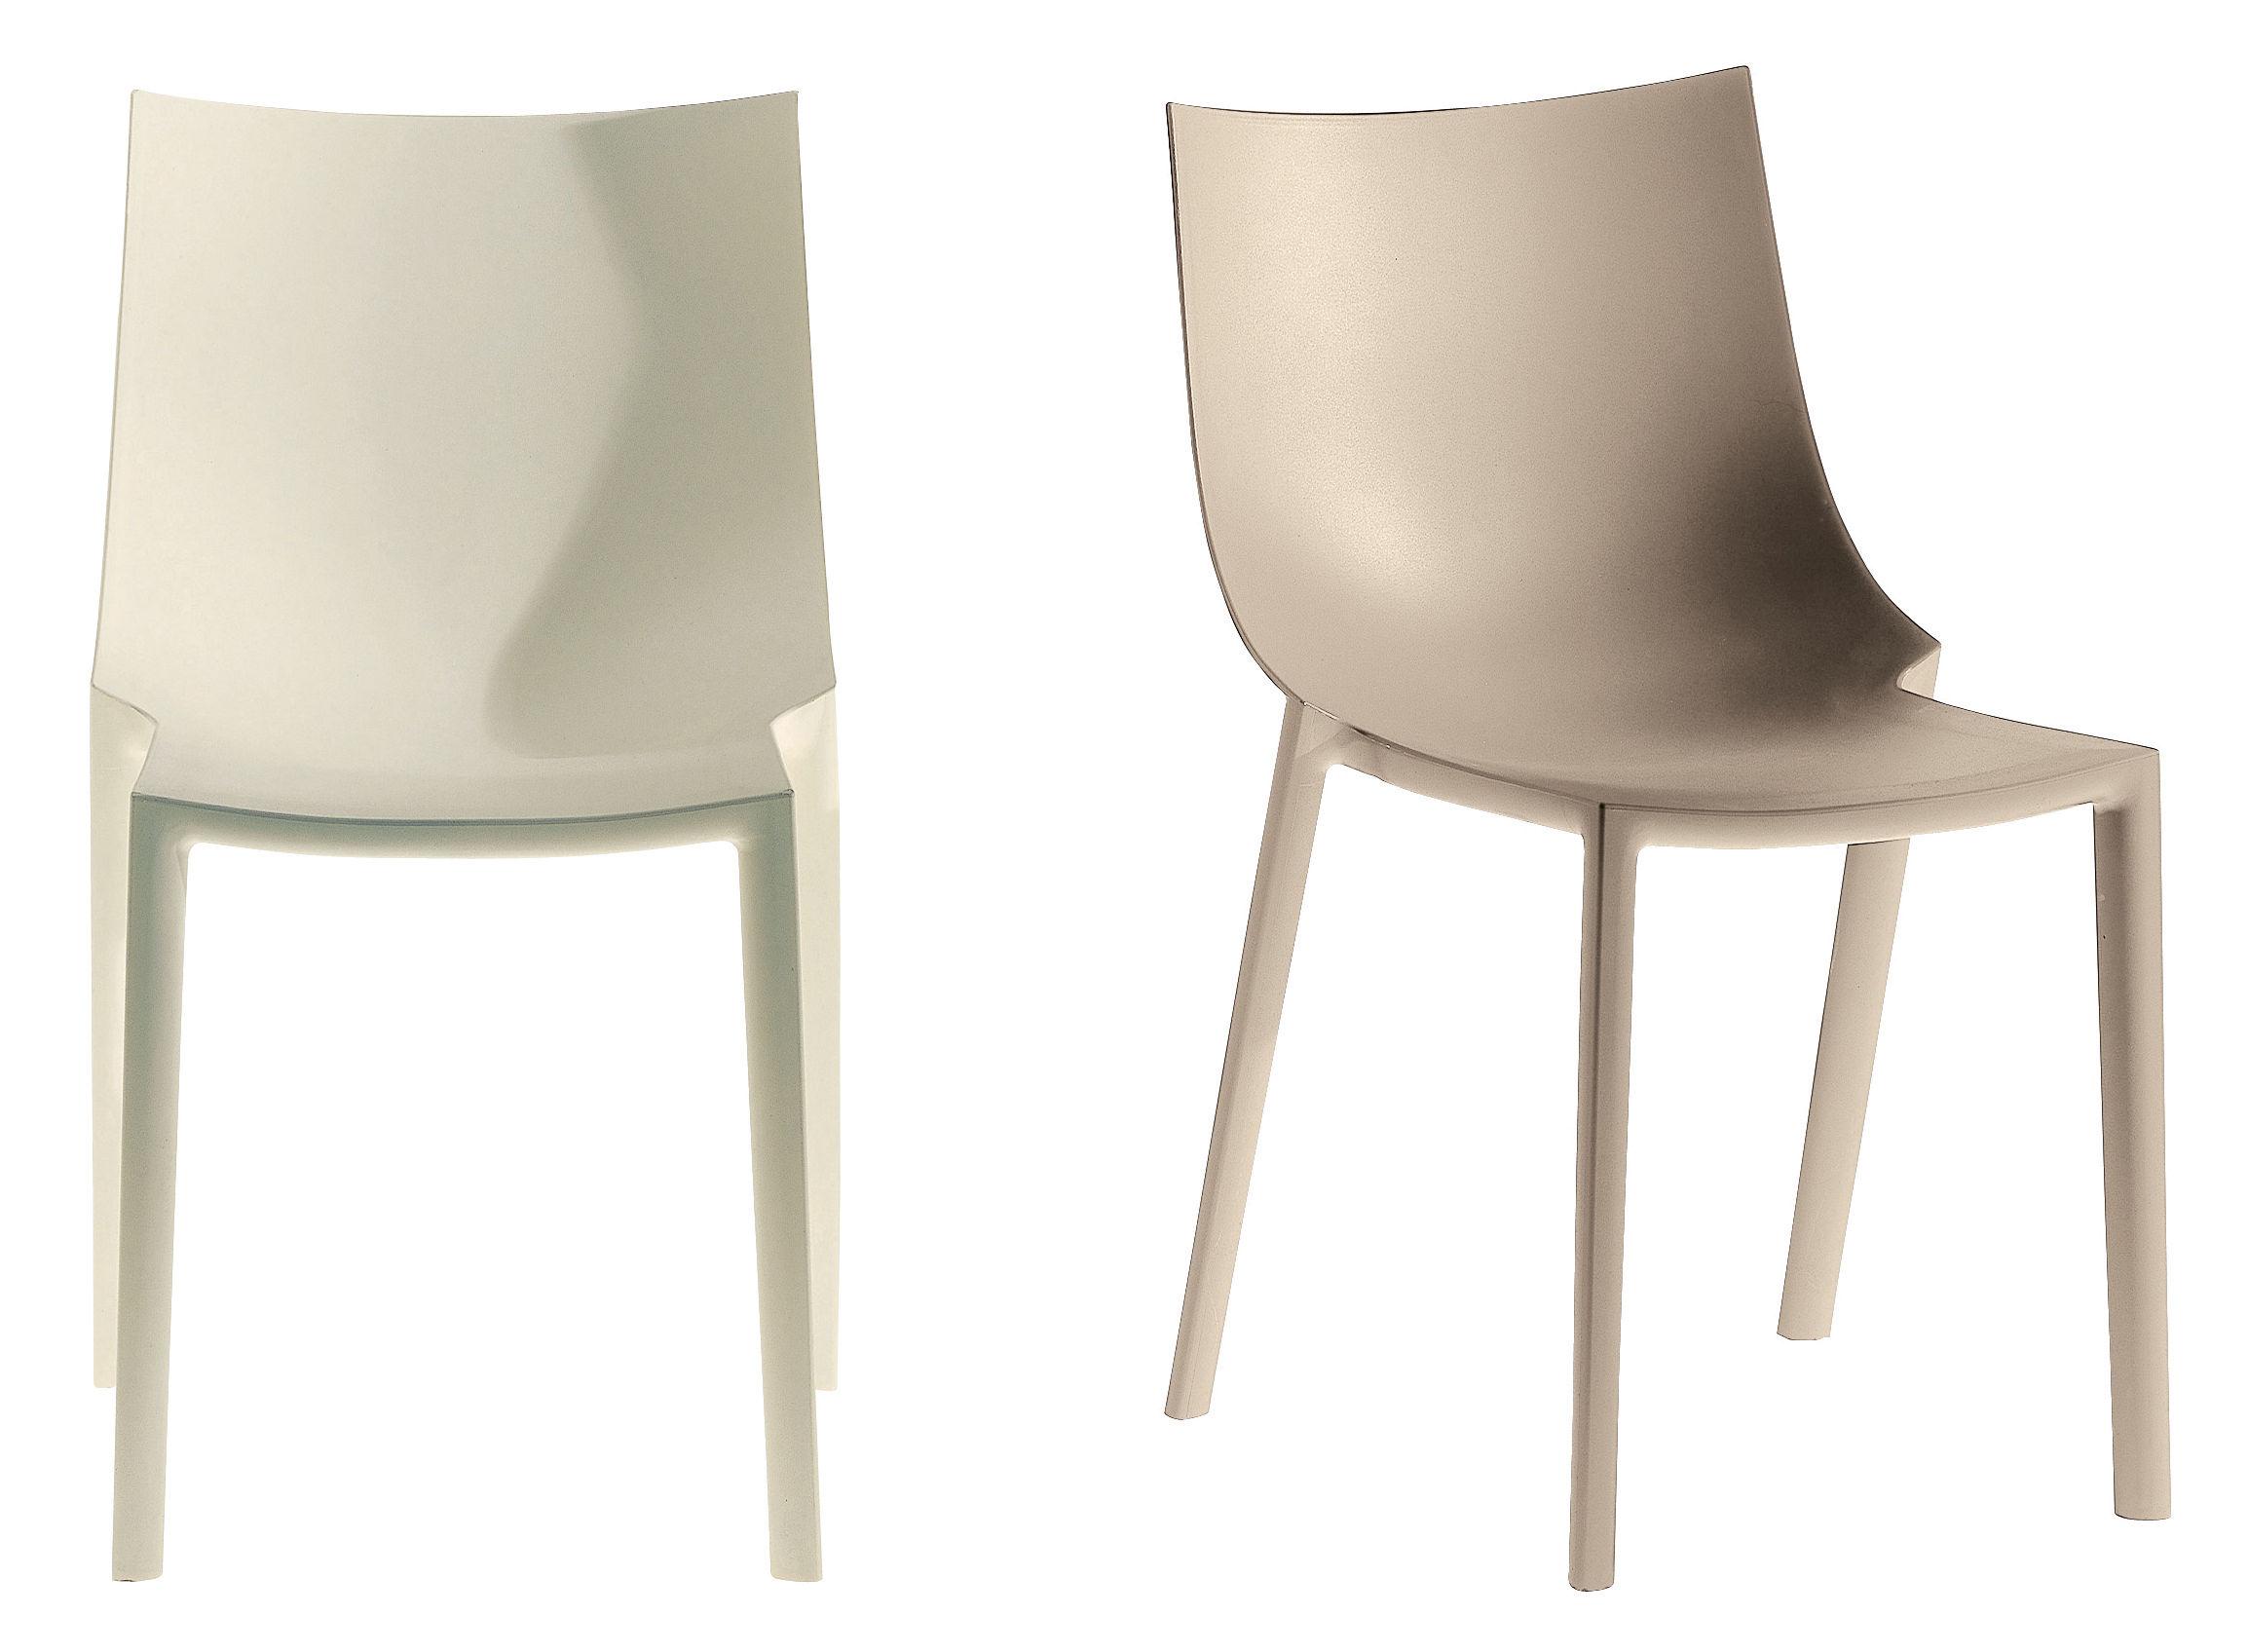 chaise empilable bo plastique blanc driade. Black Bedroom Furniture Sets. Home Design Ideas